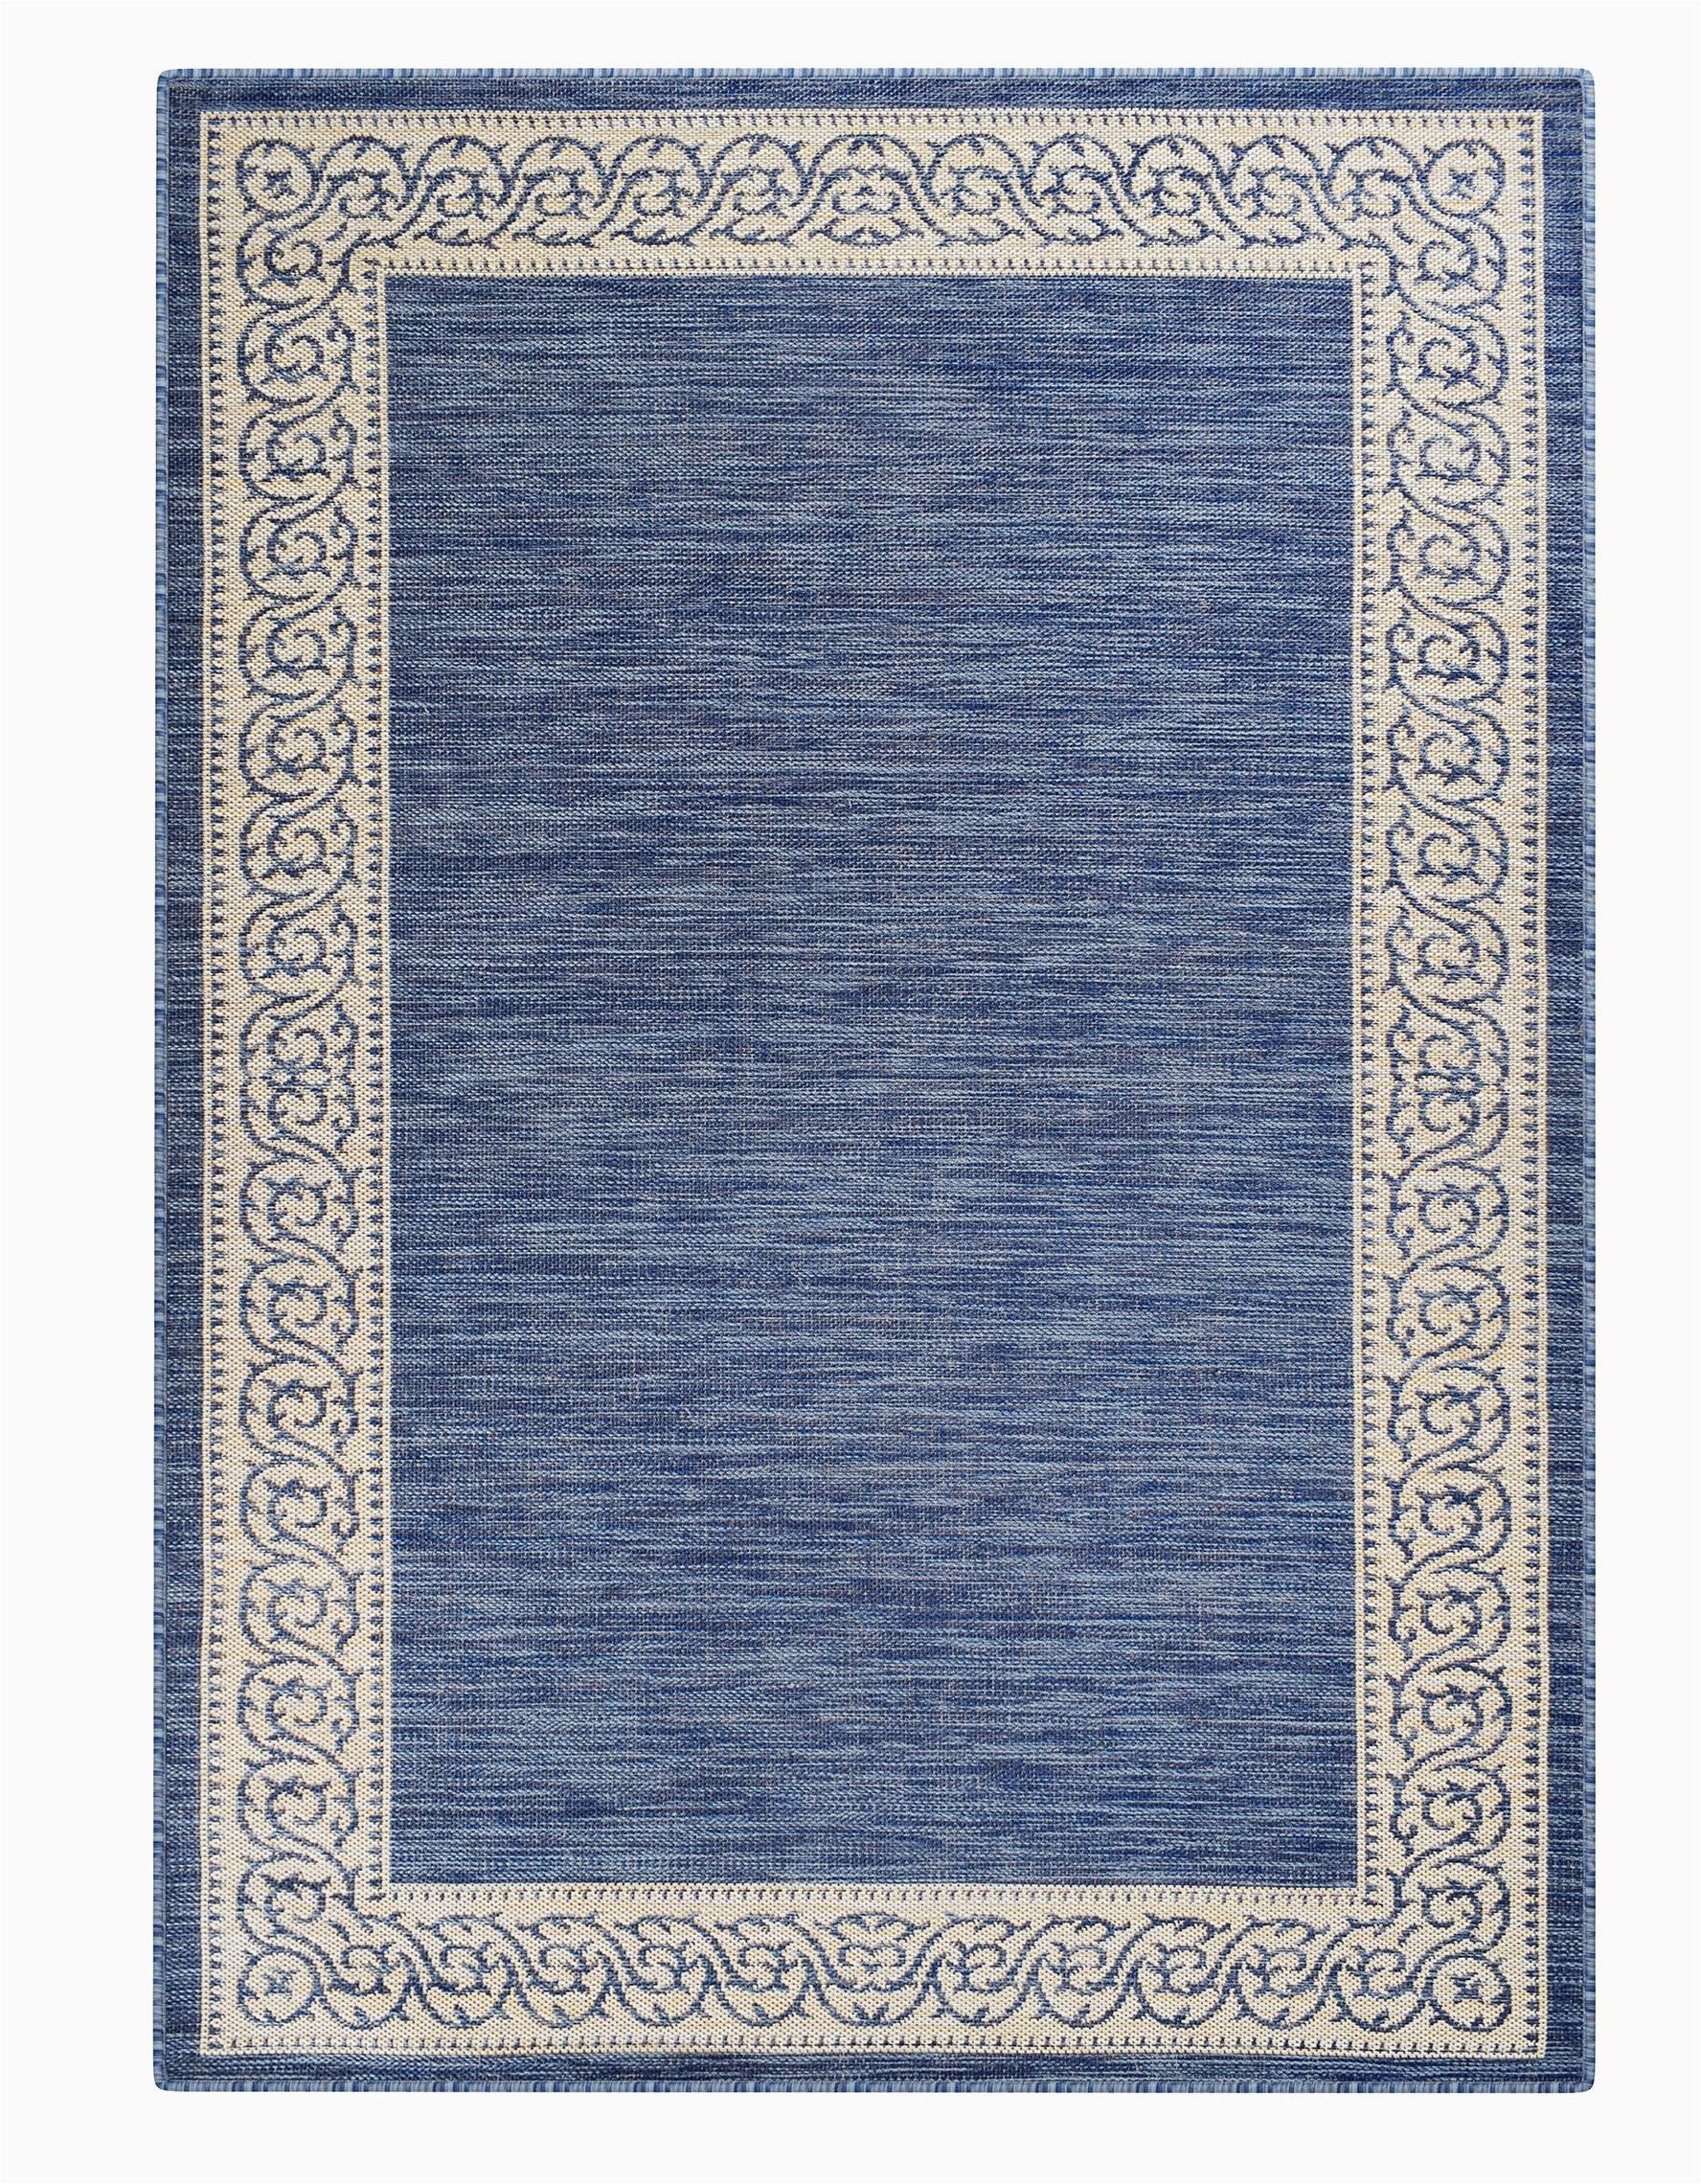 charlton home meyerwood floral shag 5 x 77 denim blue indoor outdoor area rug c